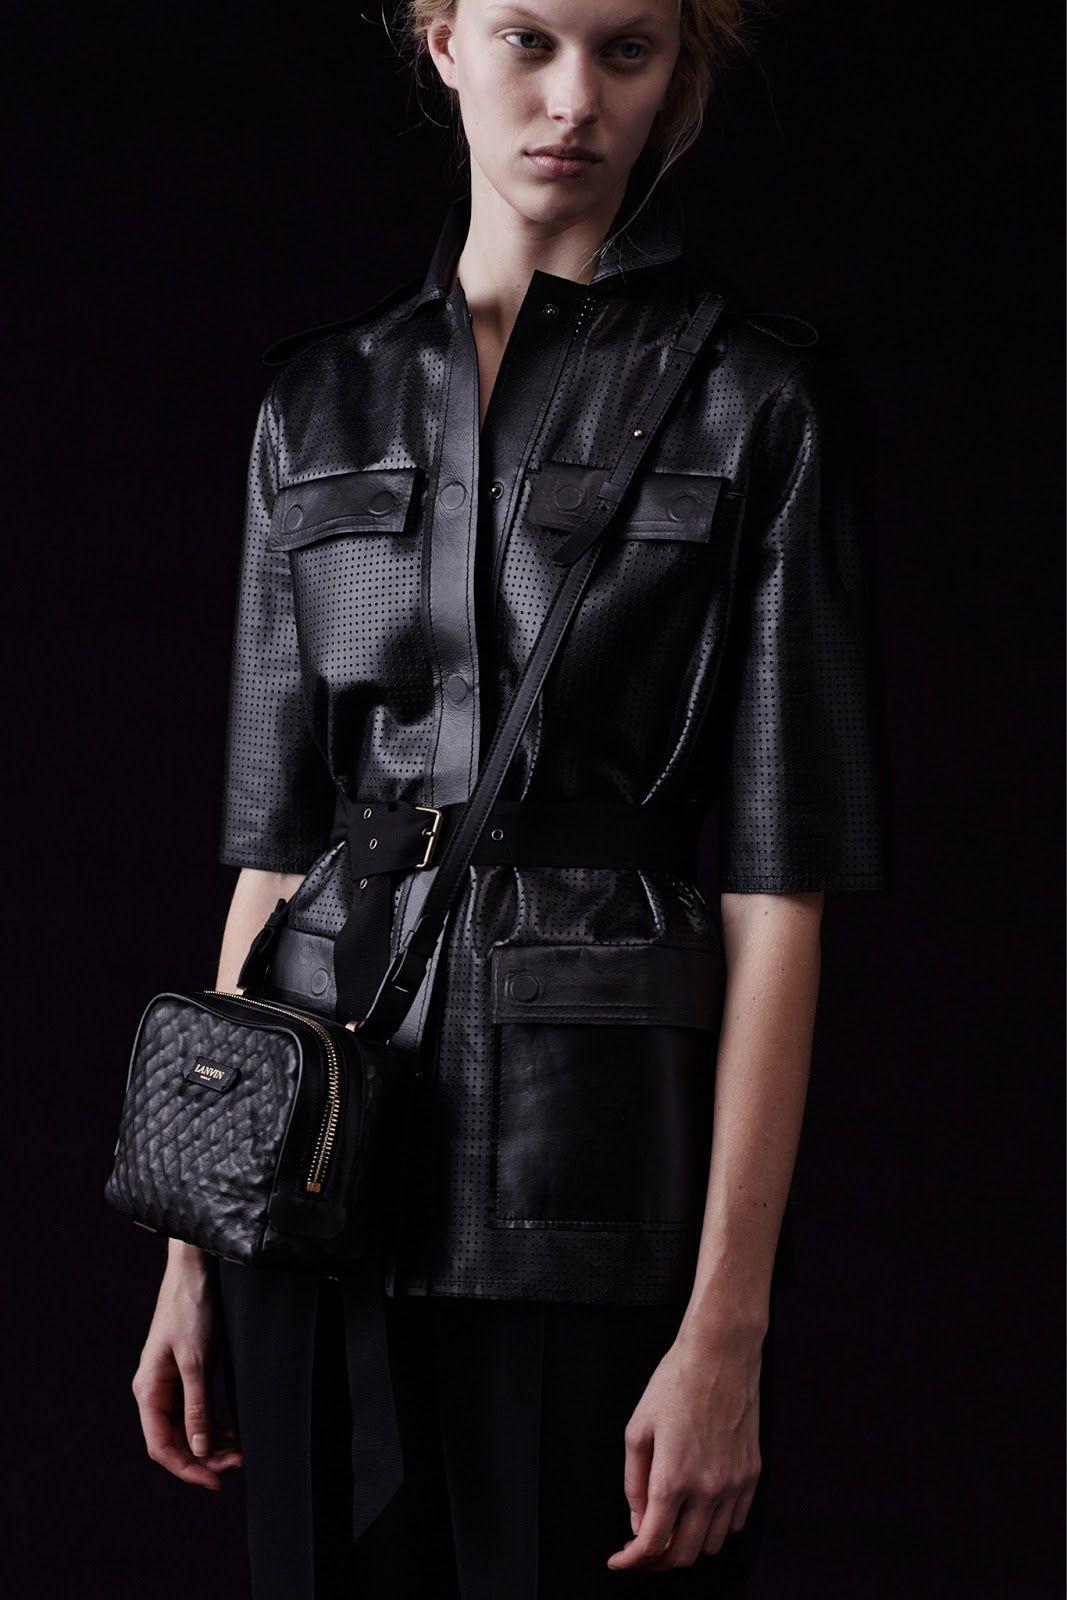 julia nobis and juliana schurig for lanvin resort 2014   visual optimism; fashion editorials, shows, campaigns & more!